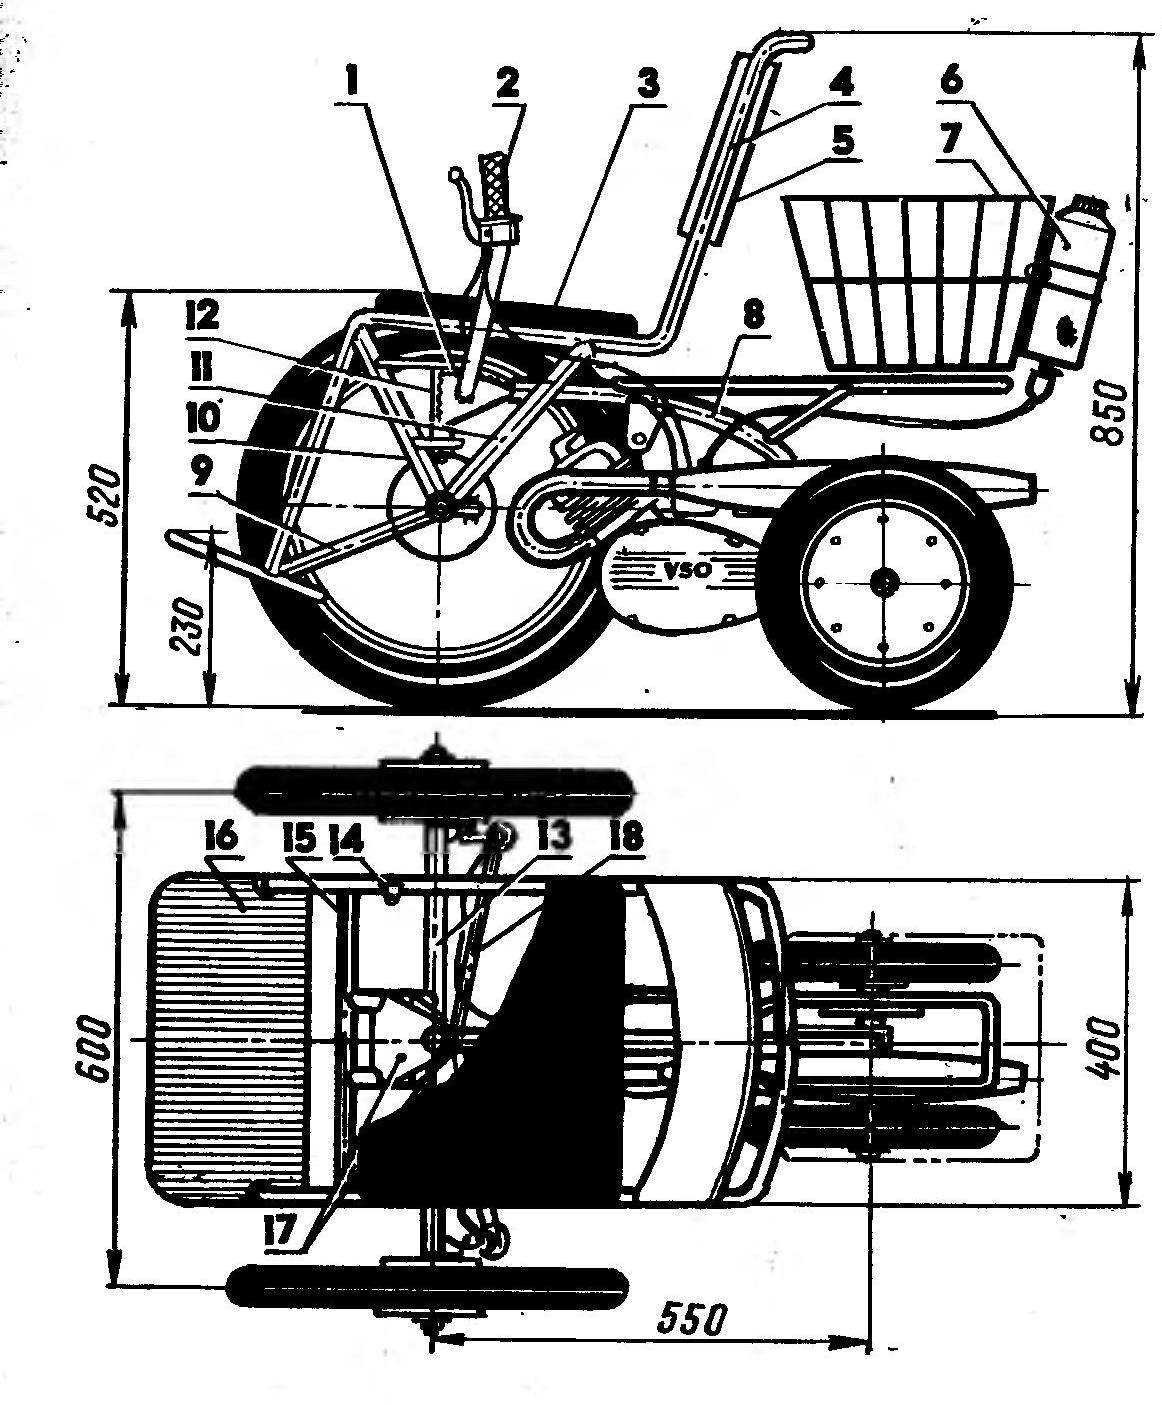 SELF-MOVING STROLLER